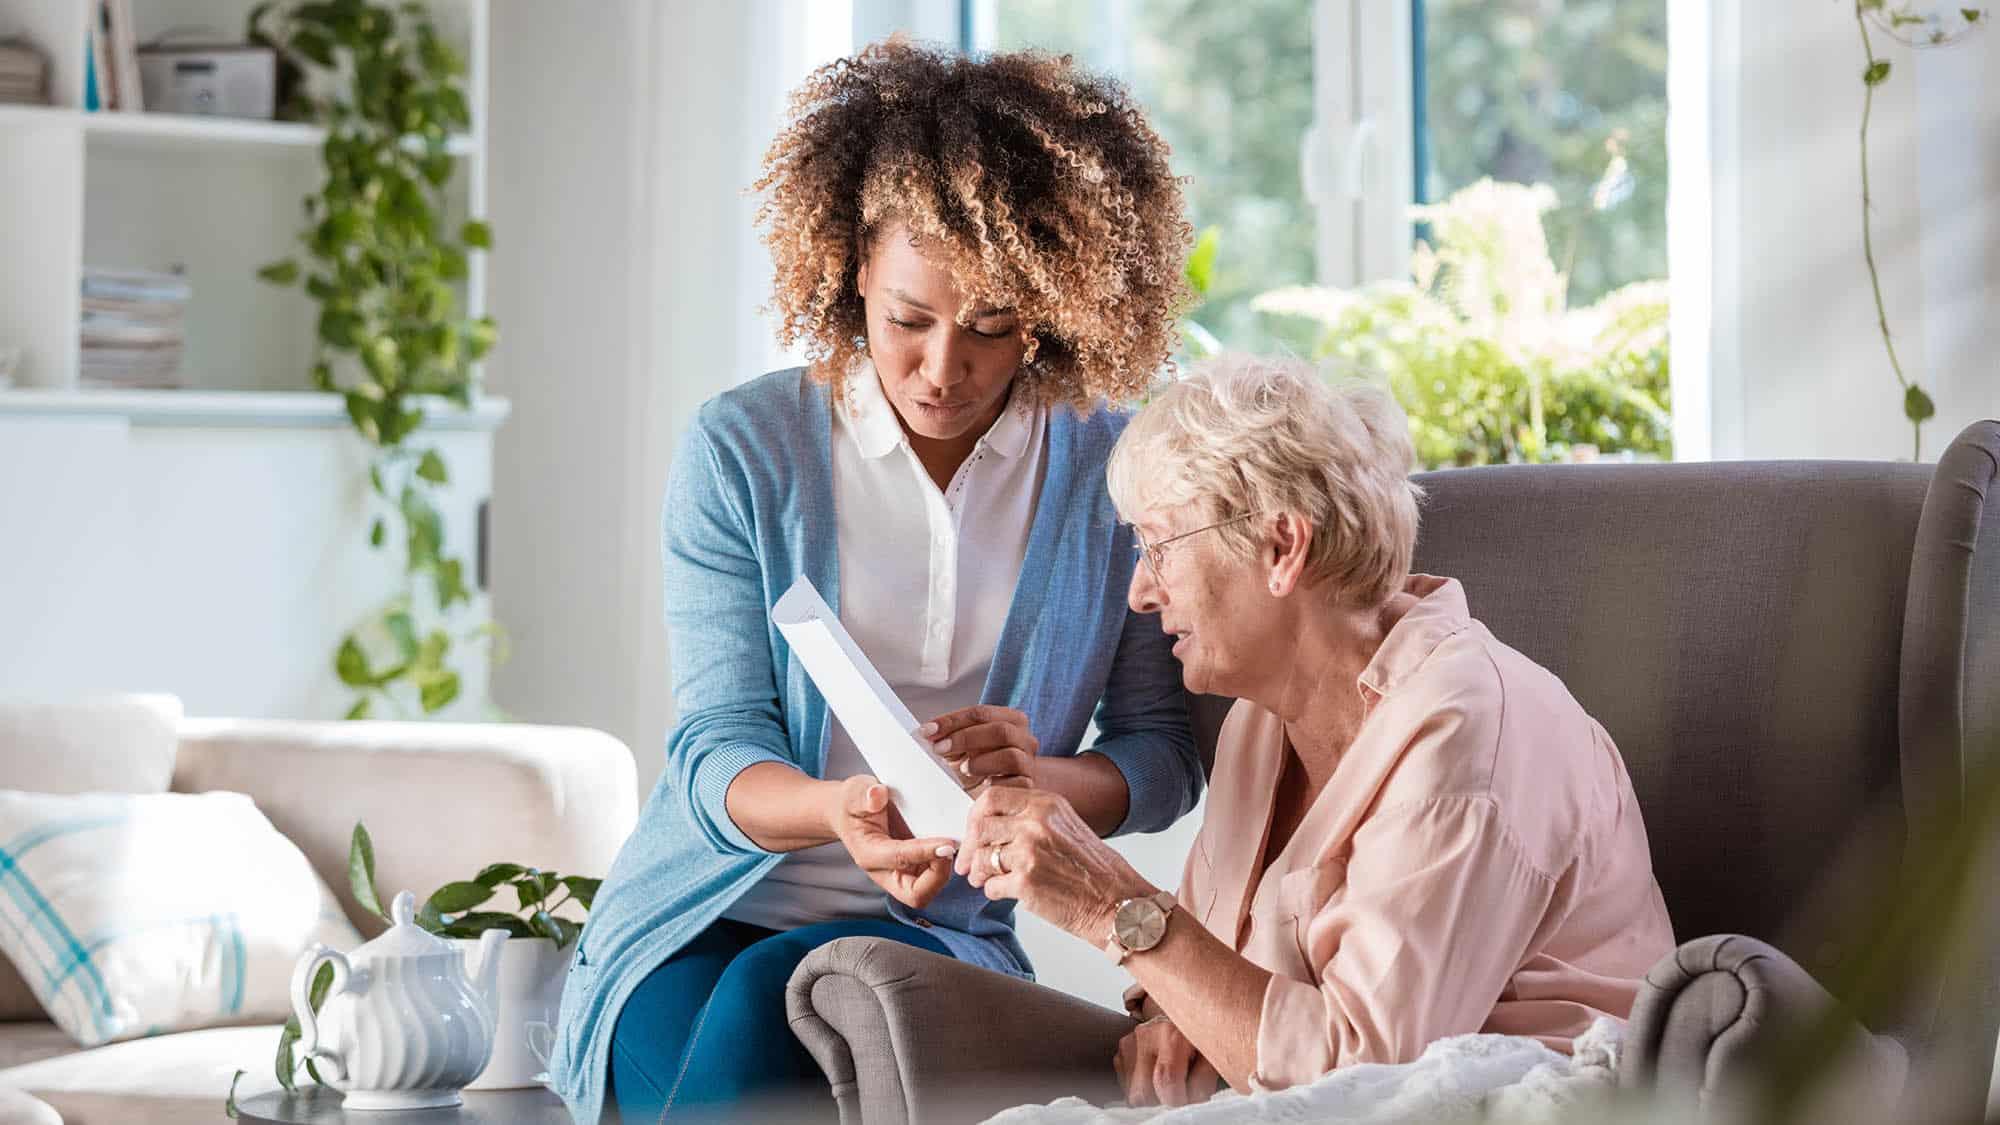 Home nurse taking care of senior woman